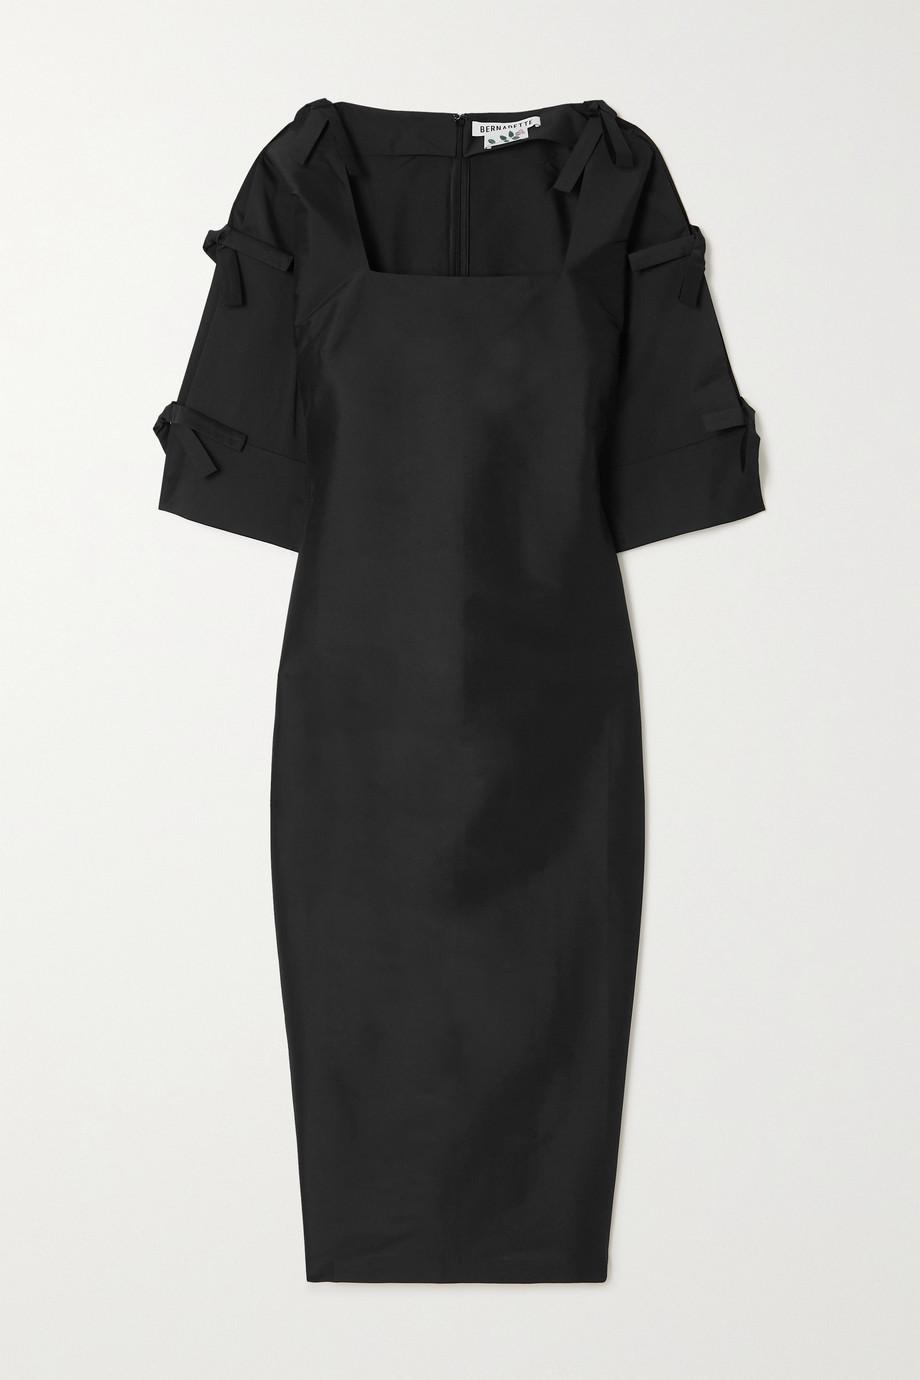 BERNADETTE Chloe bow-embellished crepe maxi dress